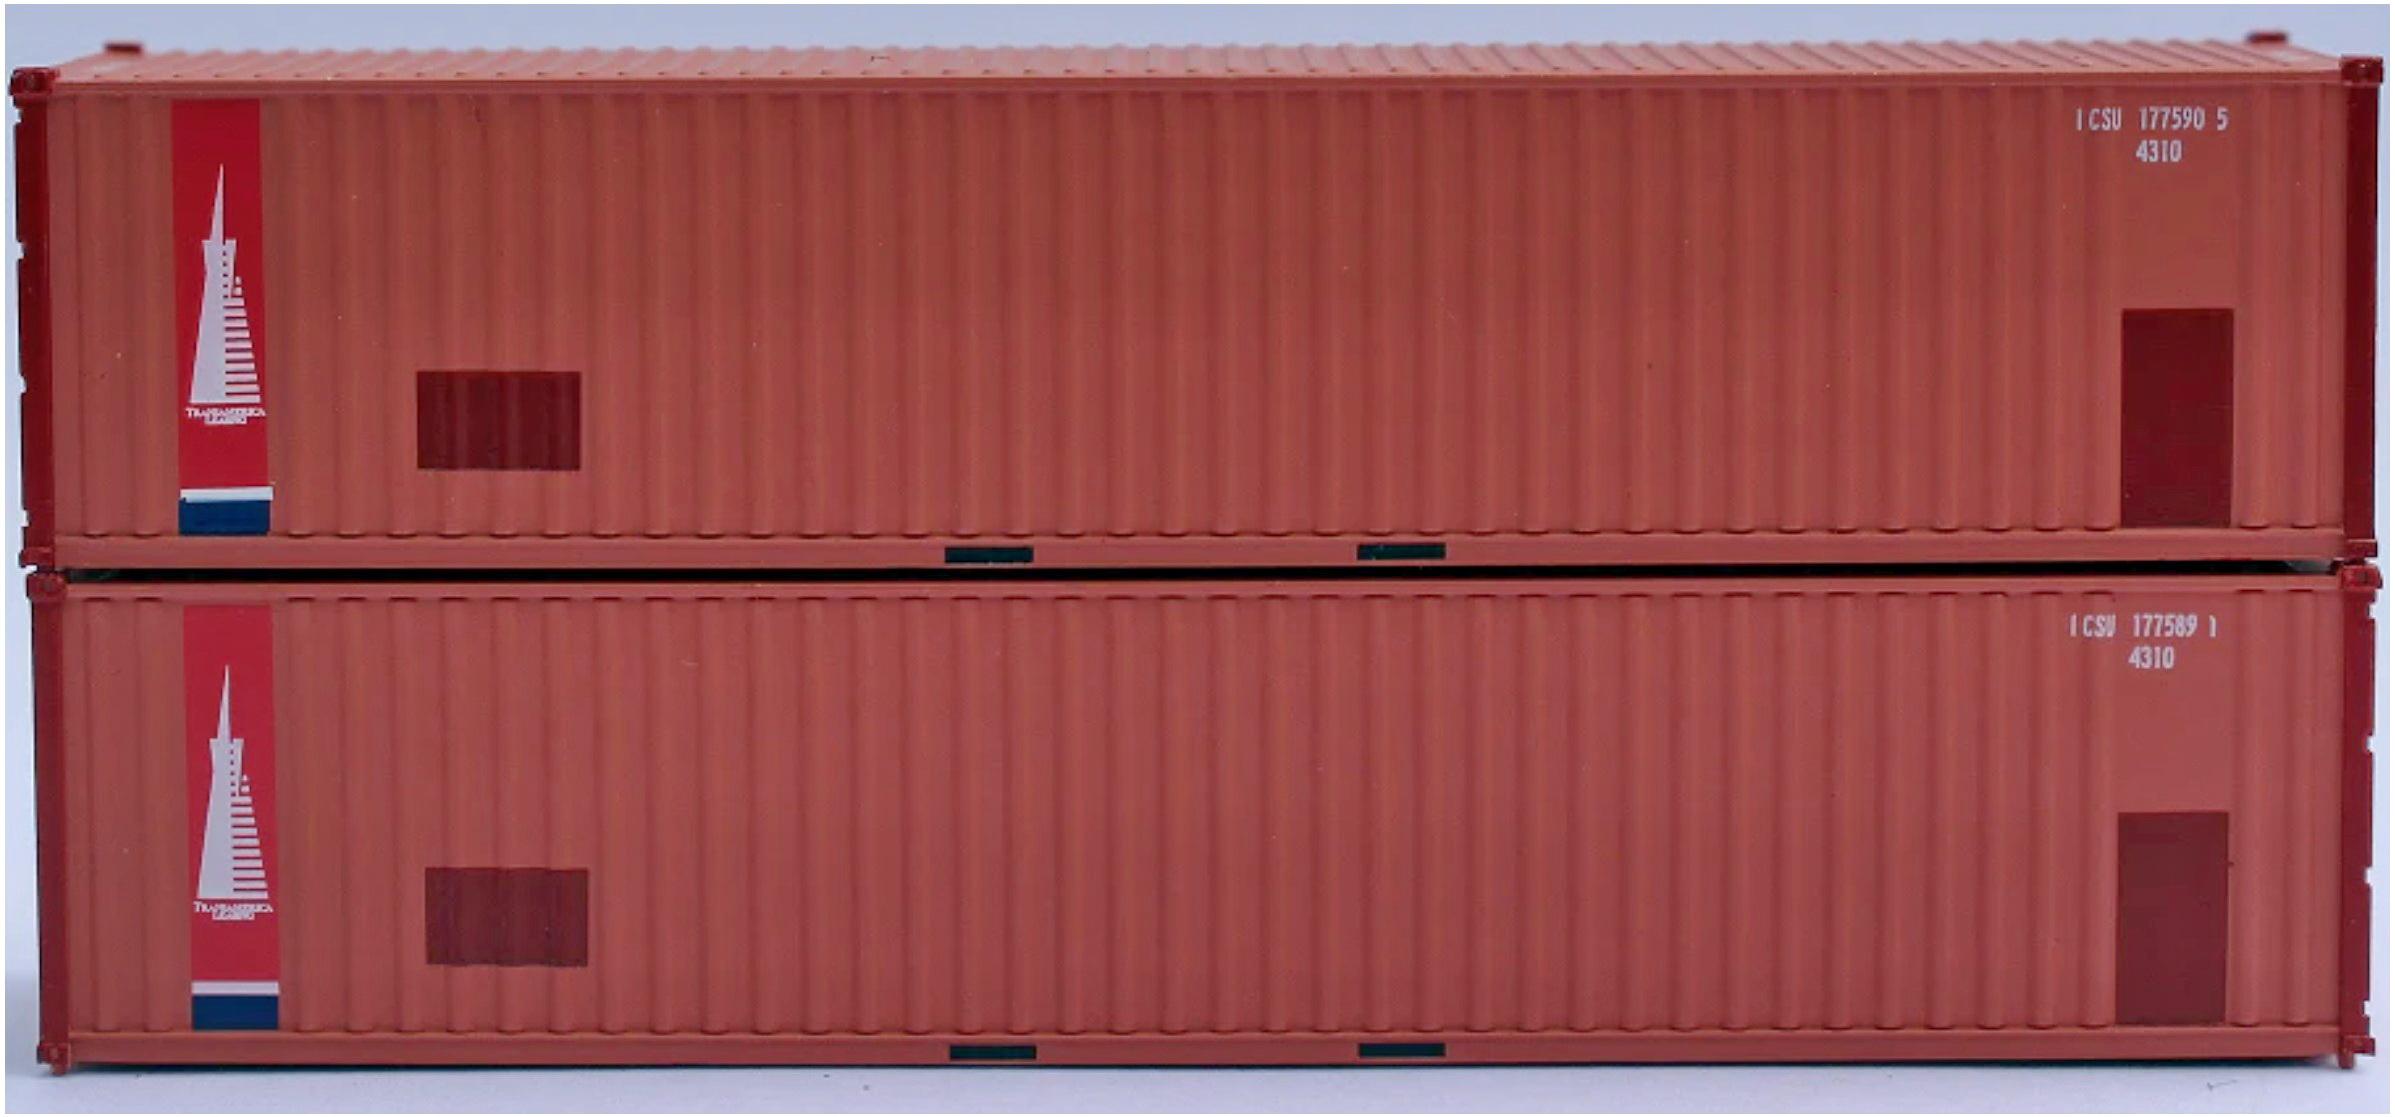 N Scale - Jacksonville Terminal - 405510 - Corrugated Side Panel - Transamerica Transportation - 2-Pack